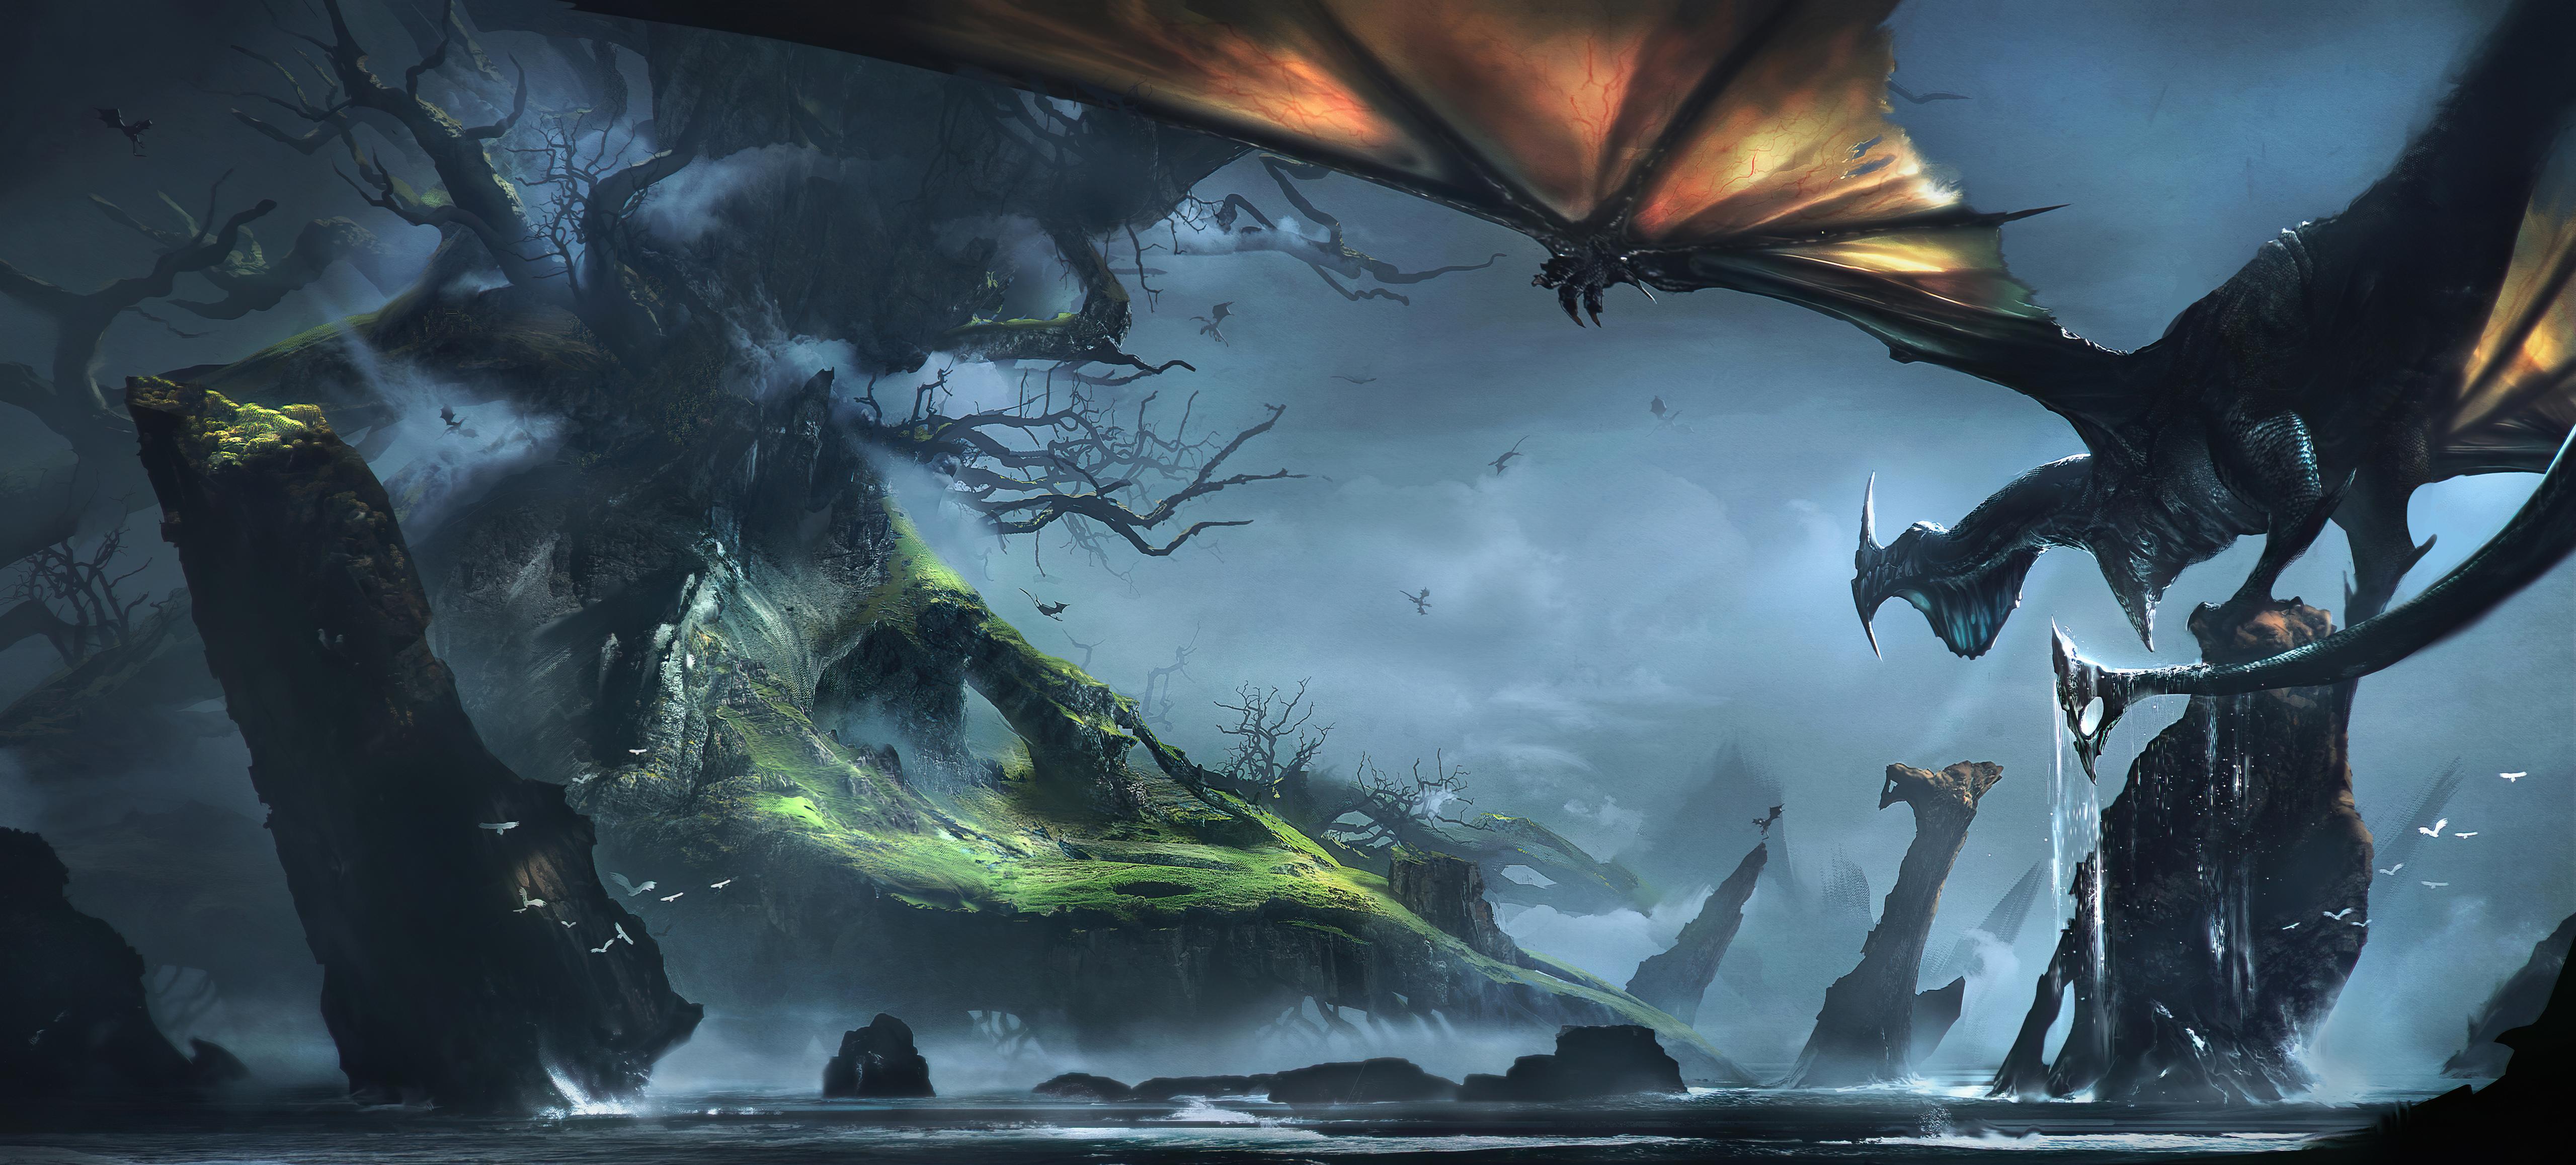 dragon land 4k 1608623022 - Dragon Land 4k - Dragon Land 4k wallpapers